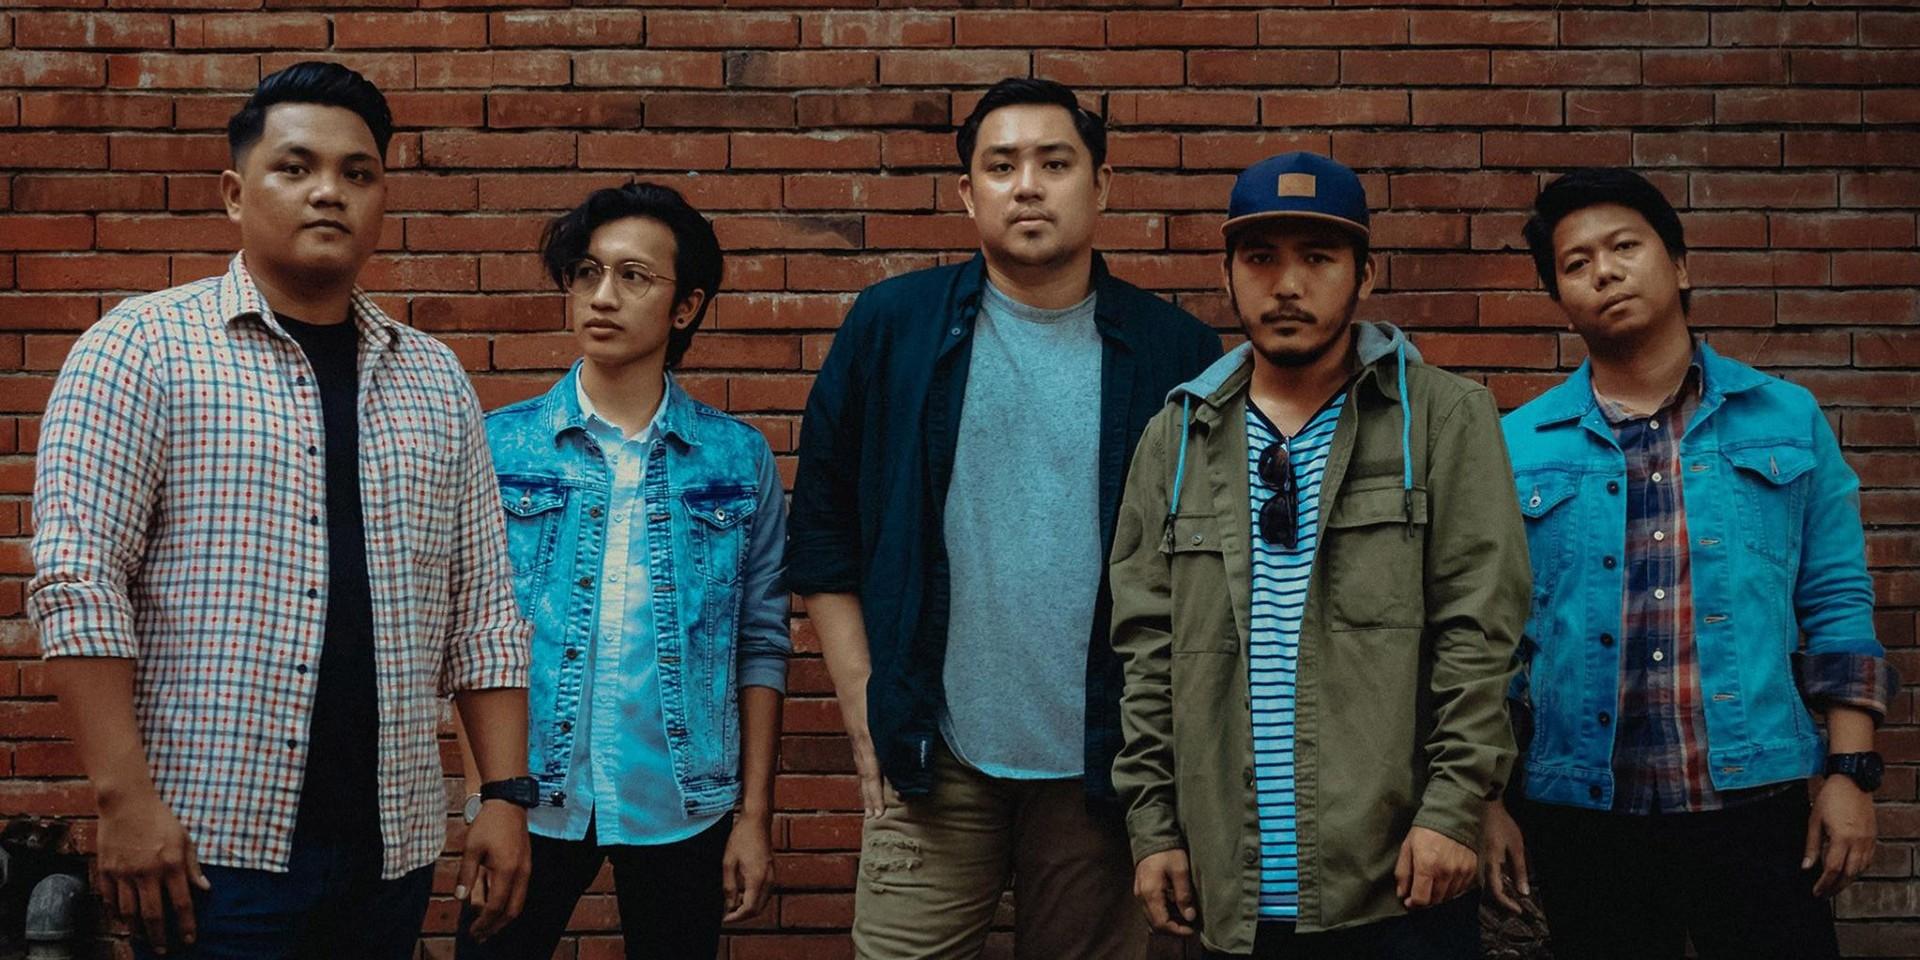 December Avenue's 'Sa Ngalan Ng Pag-Ibig' video reaches 10 million views on YouTube